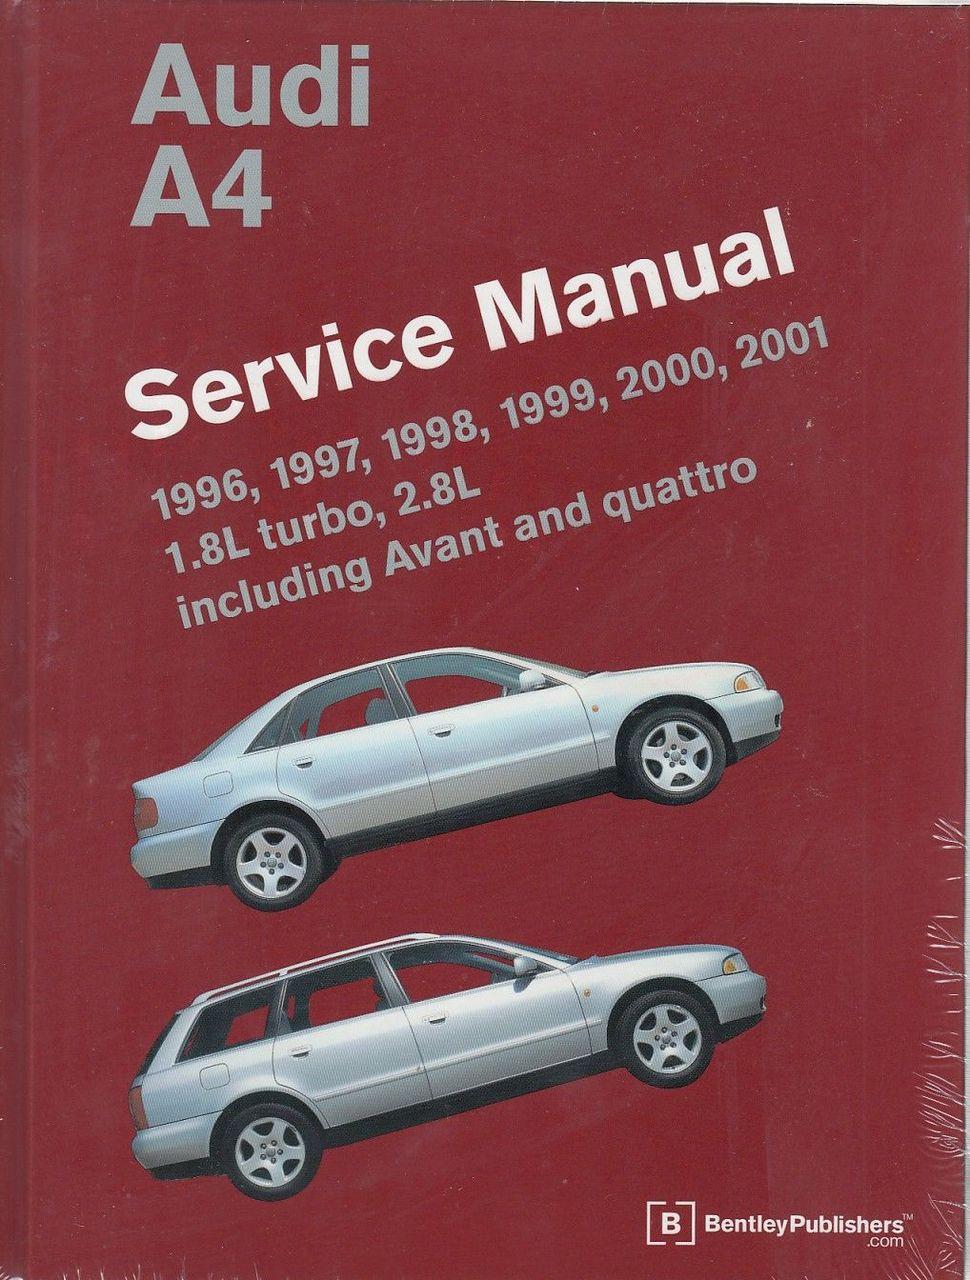 audi a4 1996 2001 workshop manual  [ 970 x 1280 Pixel ]